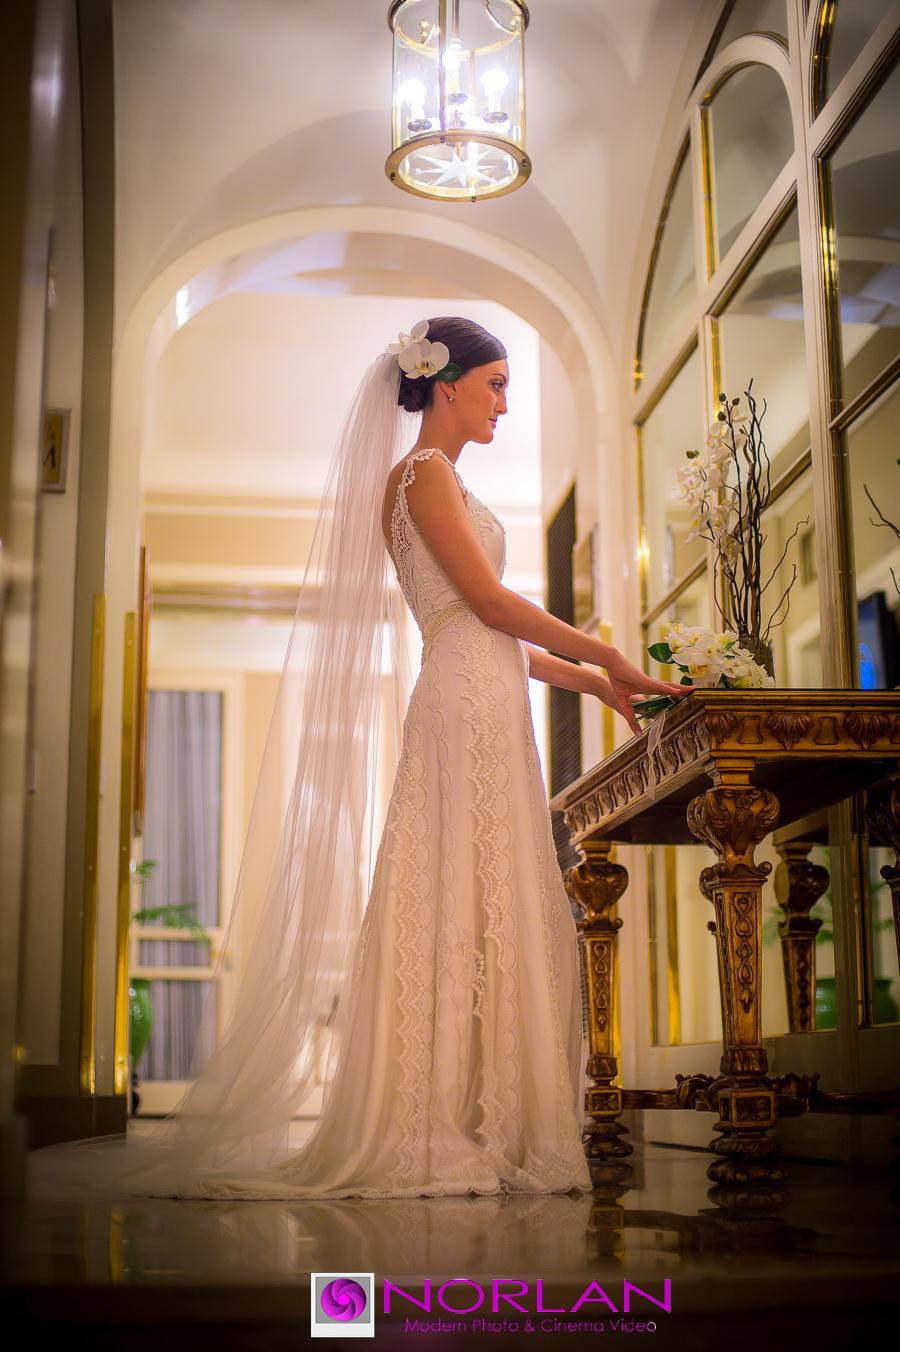 Fotos bodas-casamientos norlan-fotos de bodas en bs as- fotos de norlan estudio-fotos de moderm photo y cinema video-fotografias de bodas -fotos de novias_22